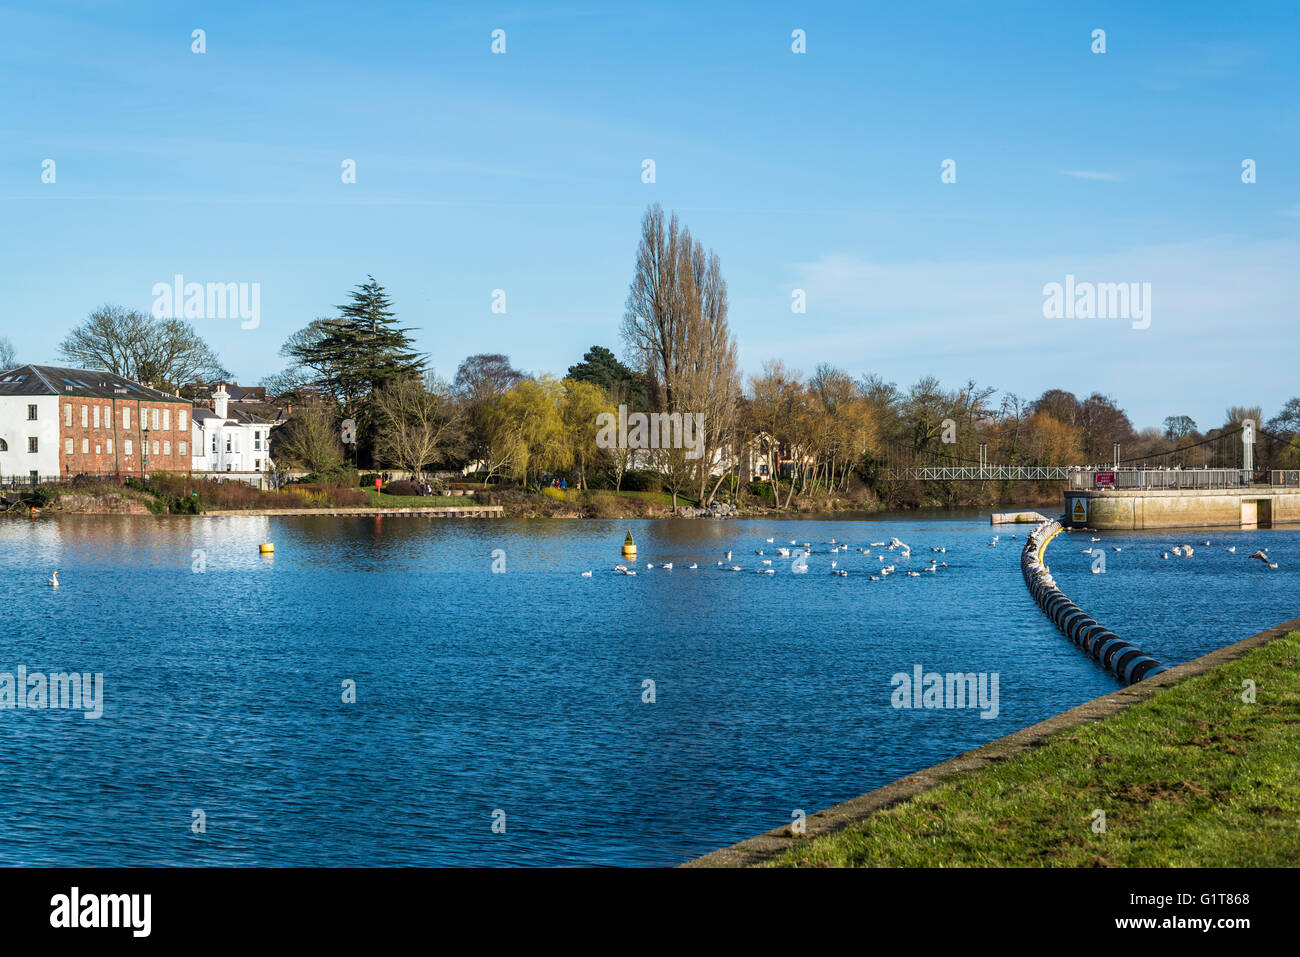 Exeter, river Exe, Devon, England, United Kingdom - Stock Image